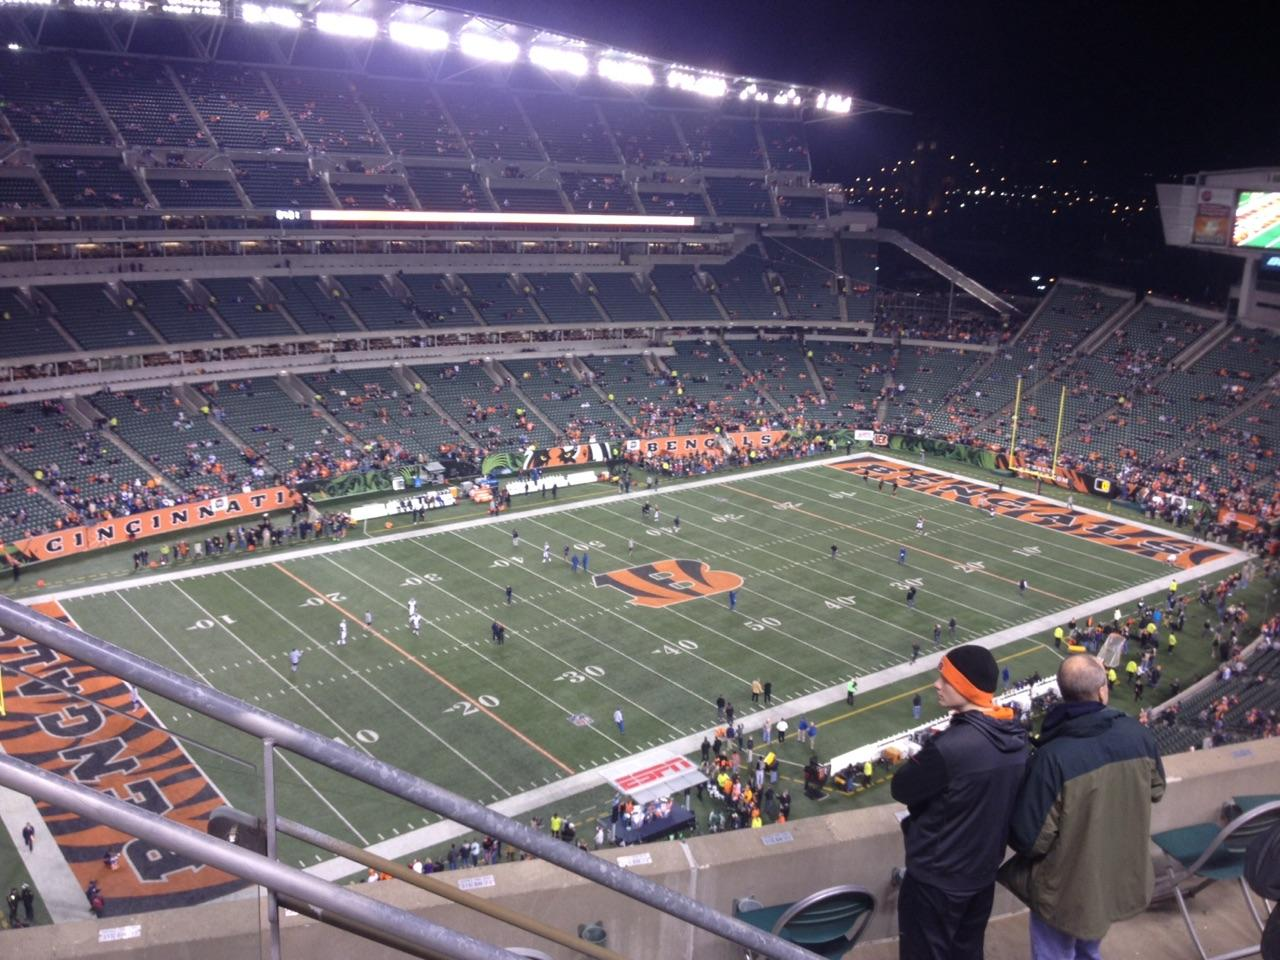 Paul Brown Stadium Section 315 Row 13 Seat 19